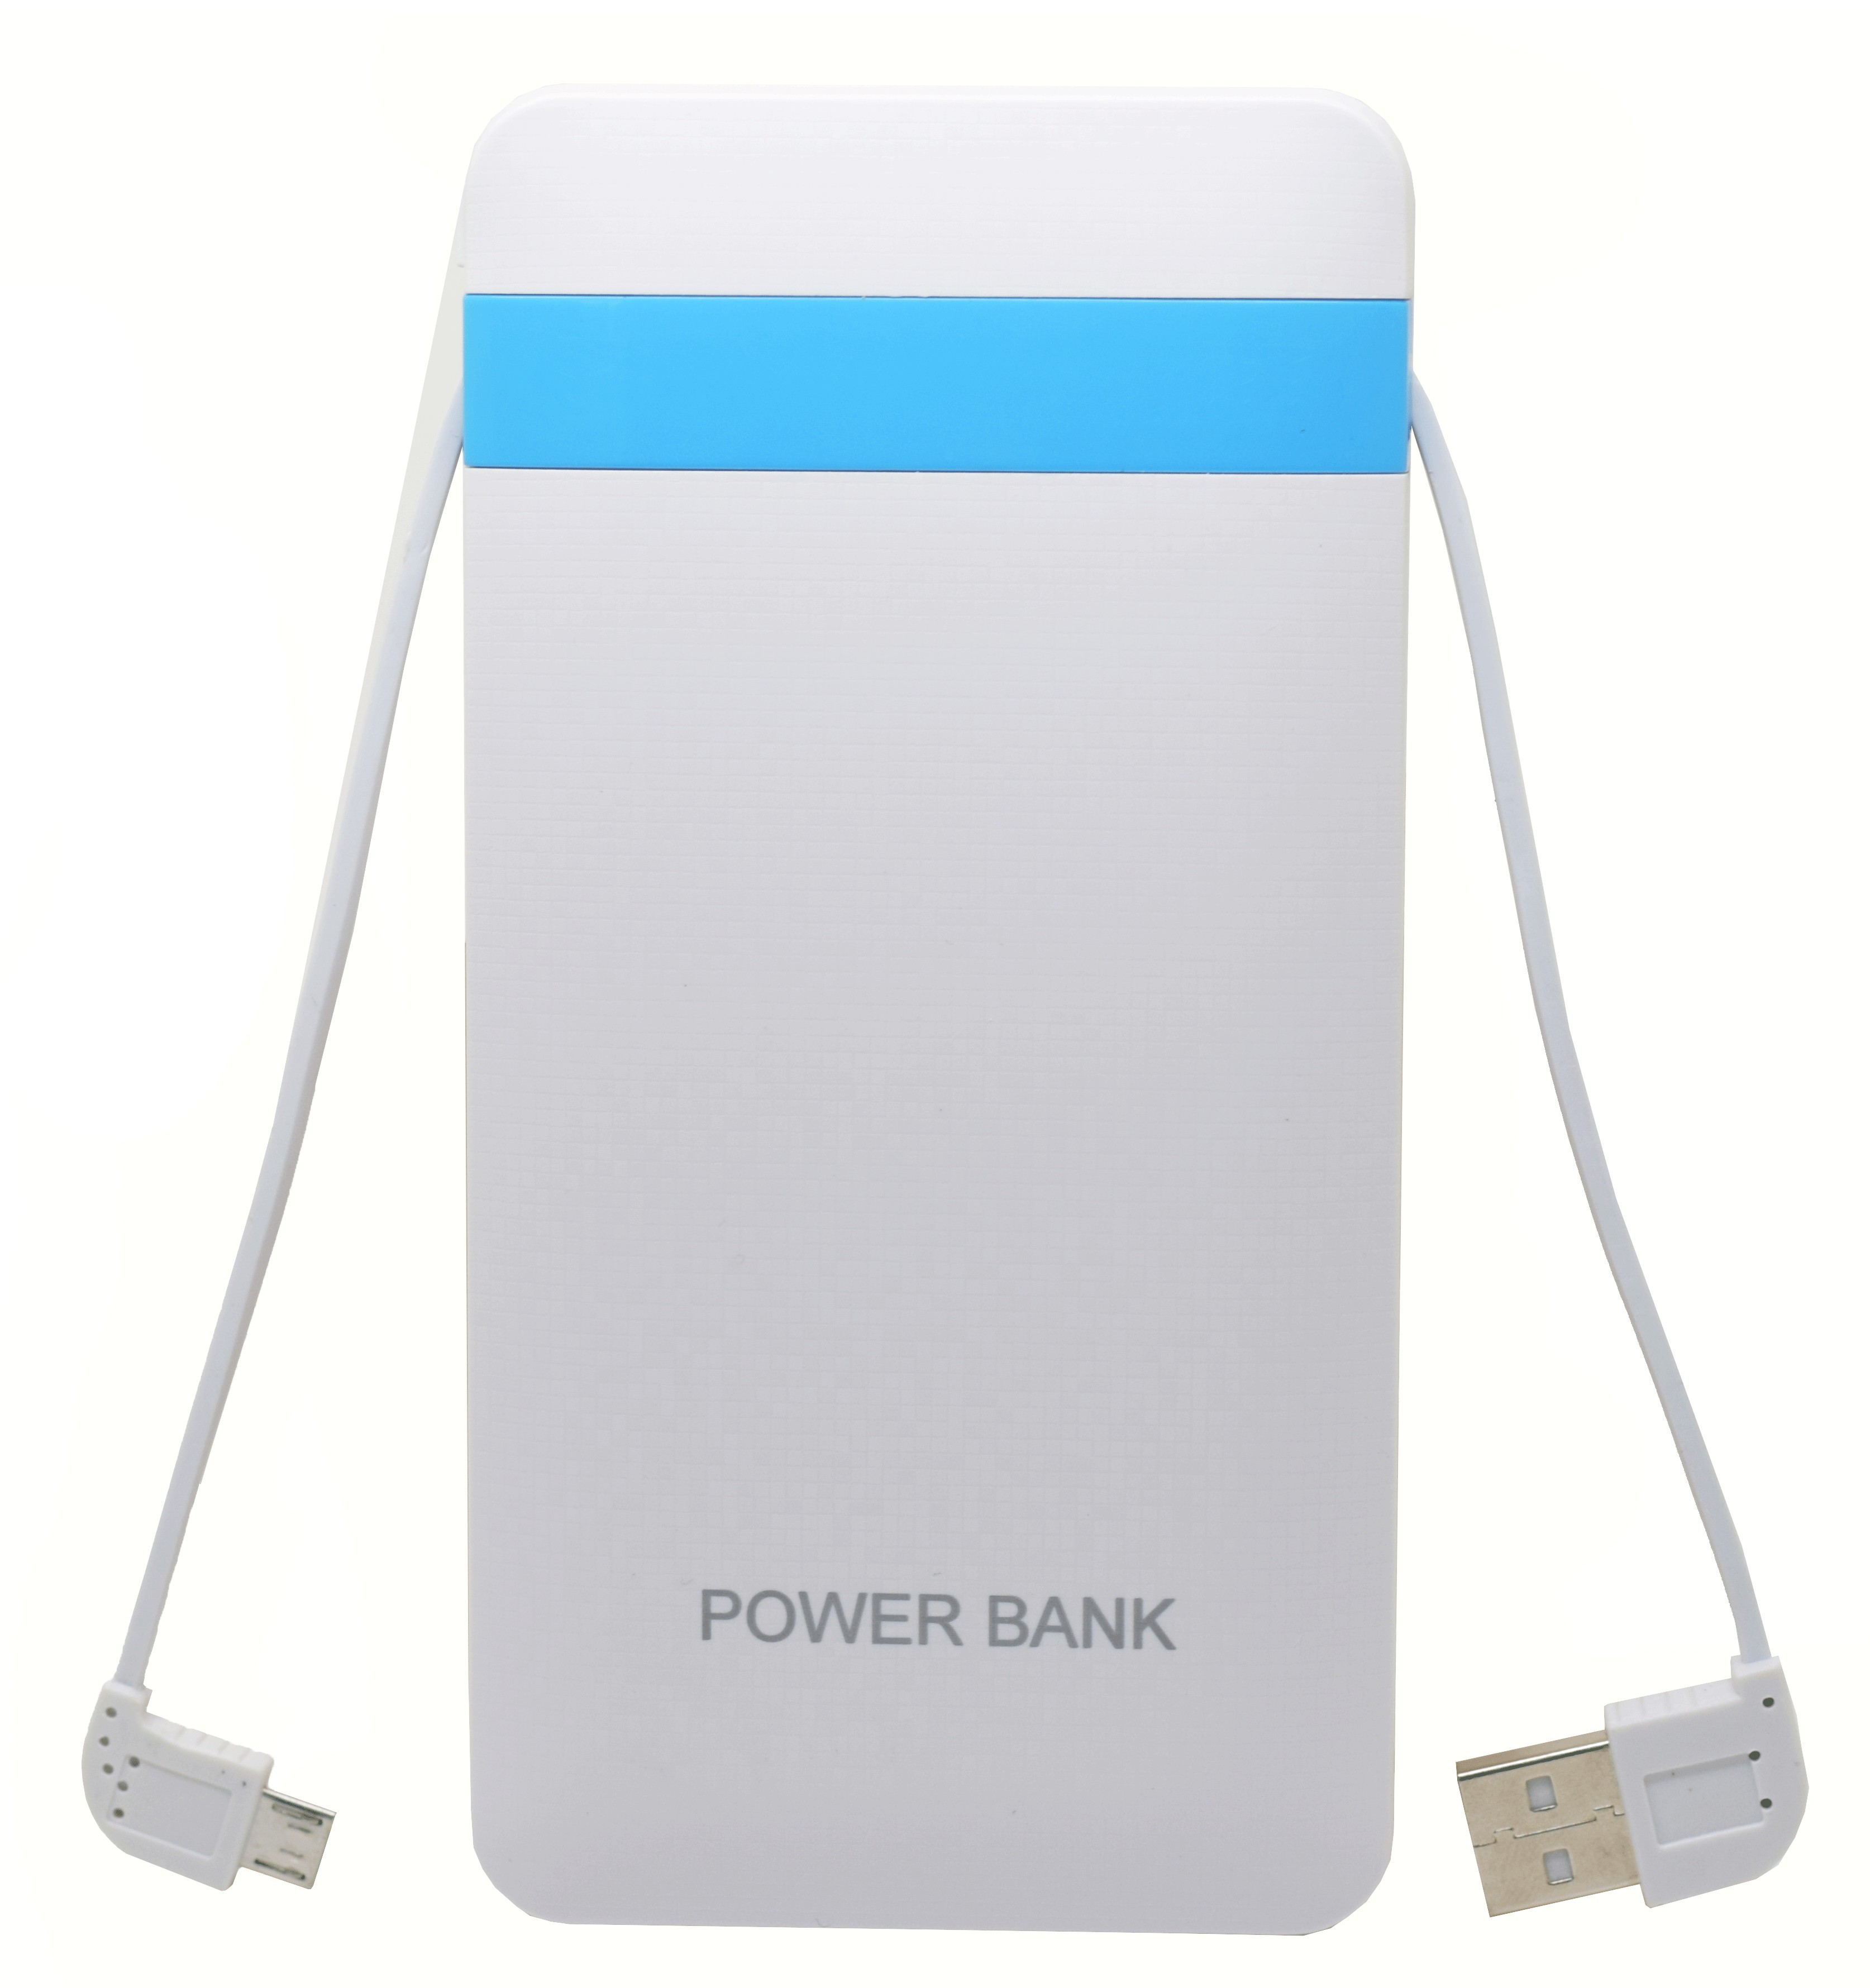 Baterie Externa Iuni Pb16, 10000mah, Dual Usb, Powerbank, White